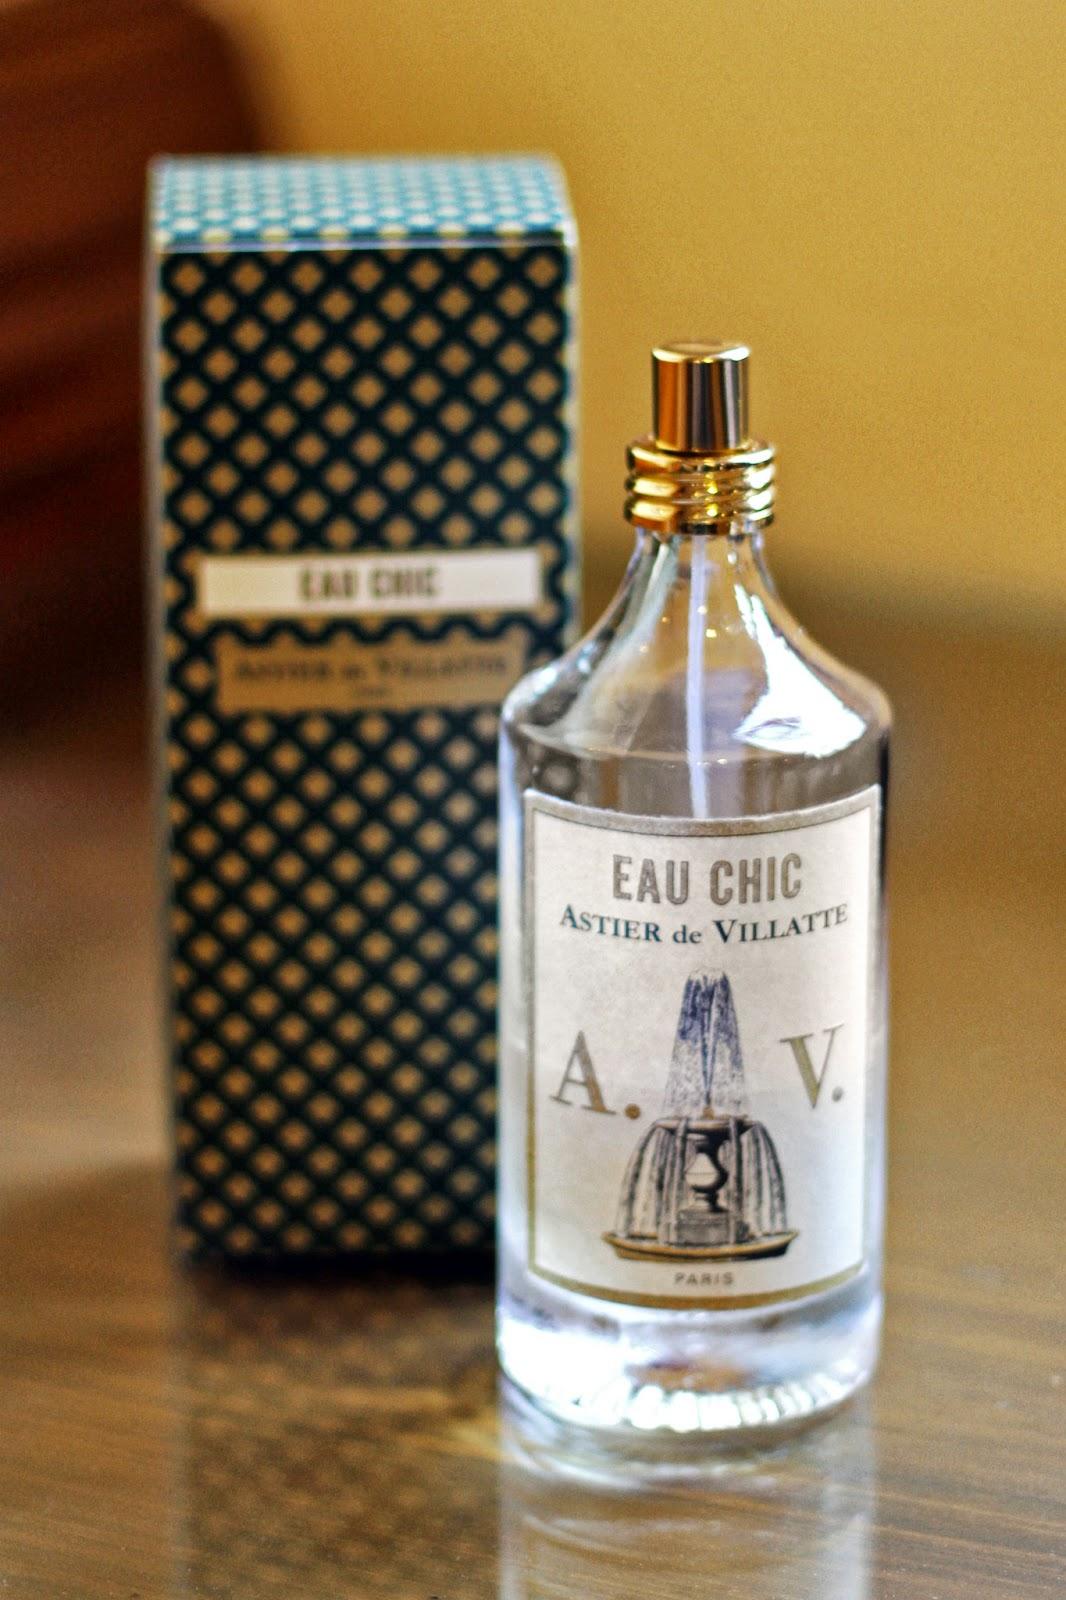 eau chic astier de villatte perfume a fragrance for women and men 2008. Black Bedroom Furniture Sets. Home Design Ideas